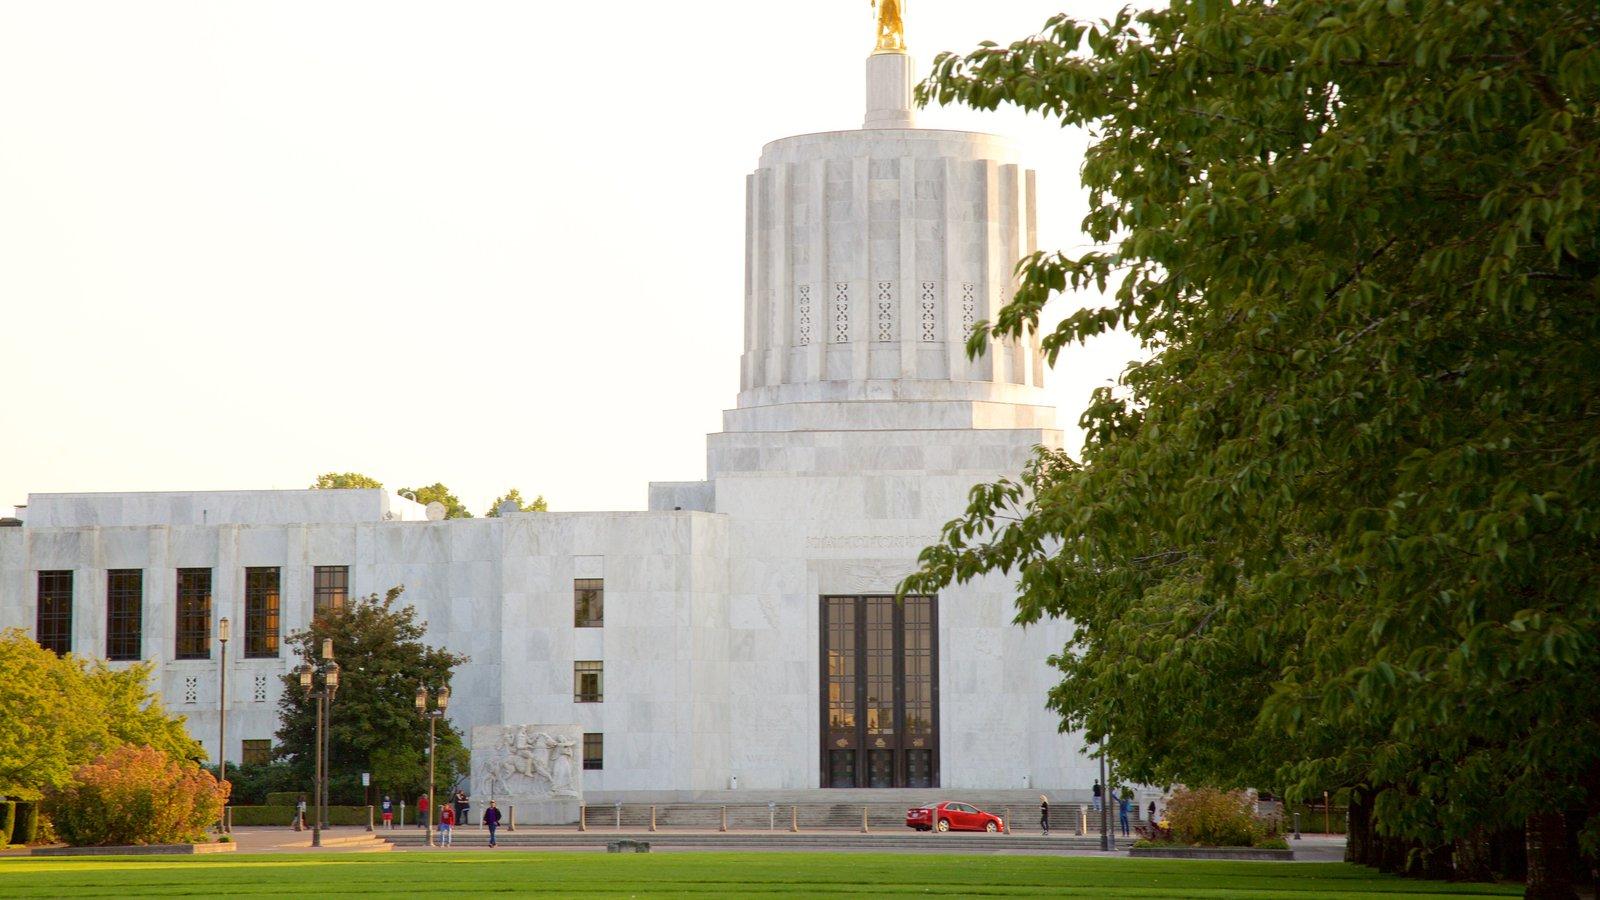 Oregon State Capitol ofreciendo escenas urbanas